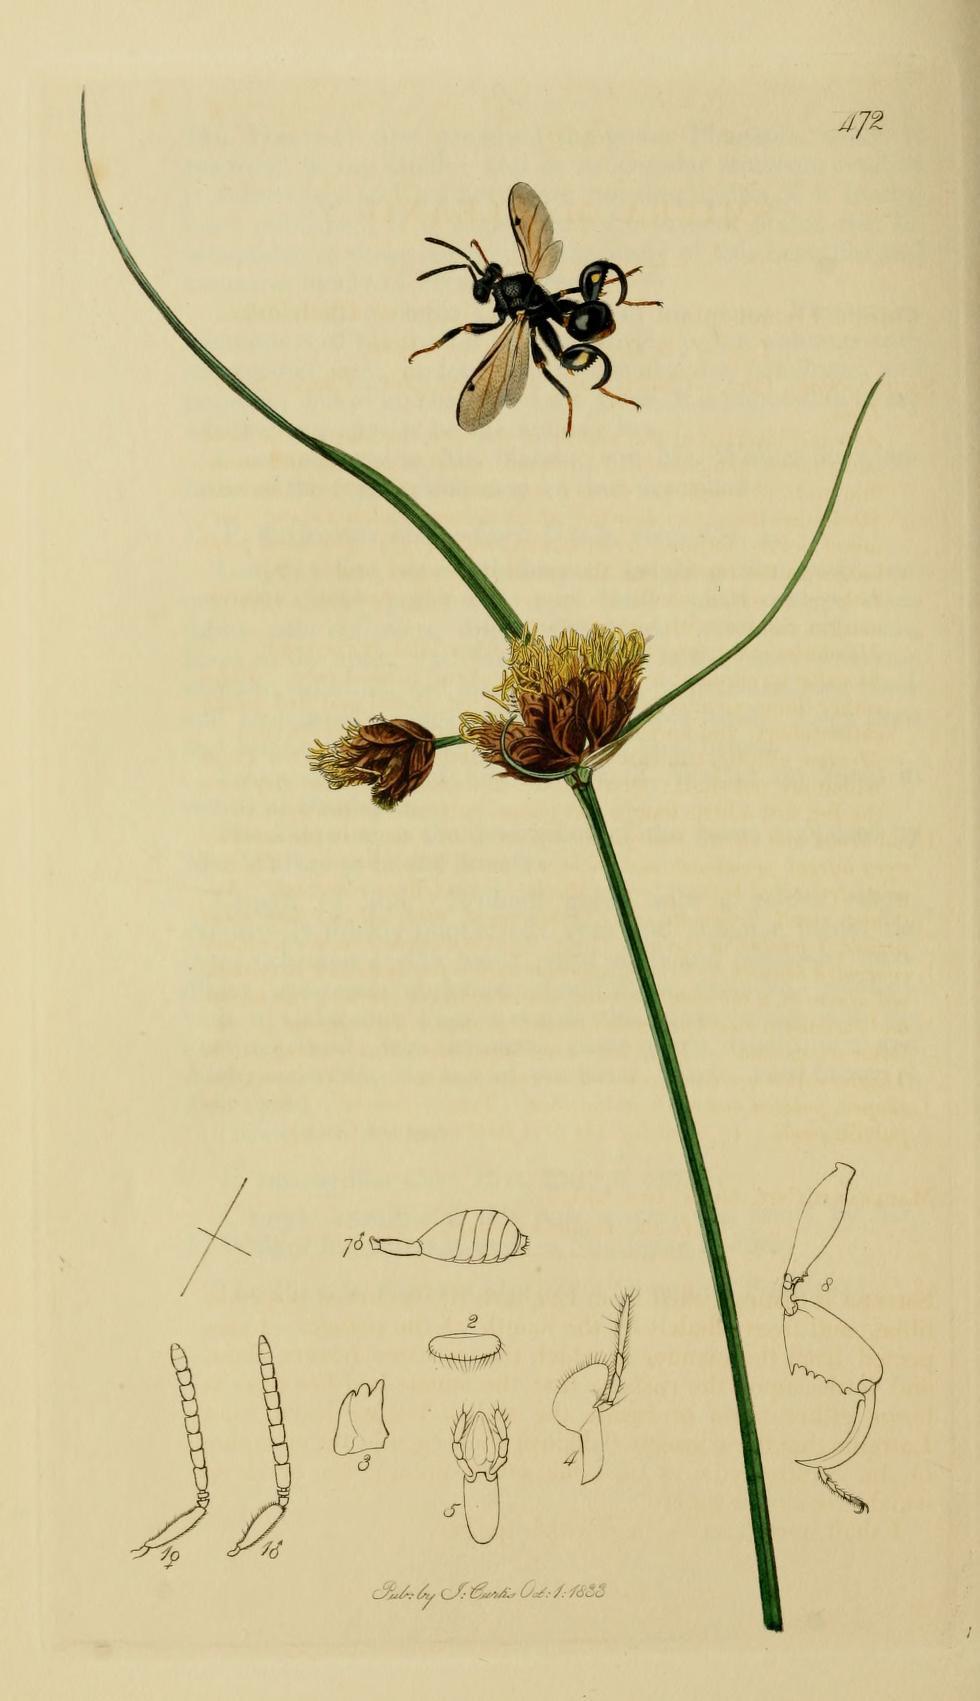 Image of Chalcis